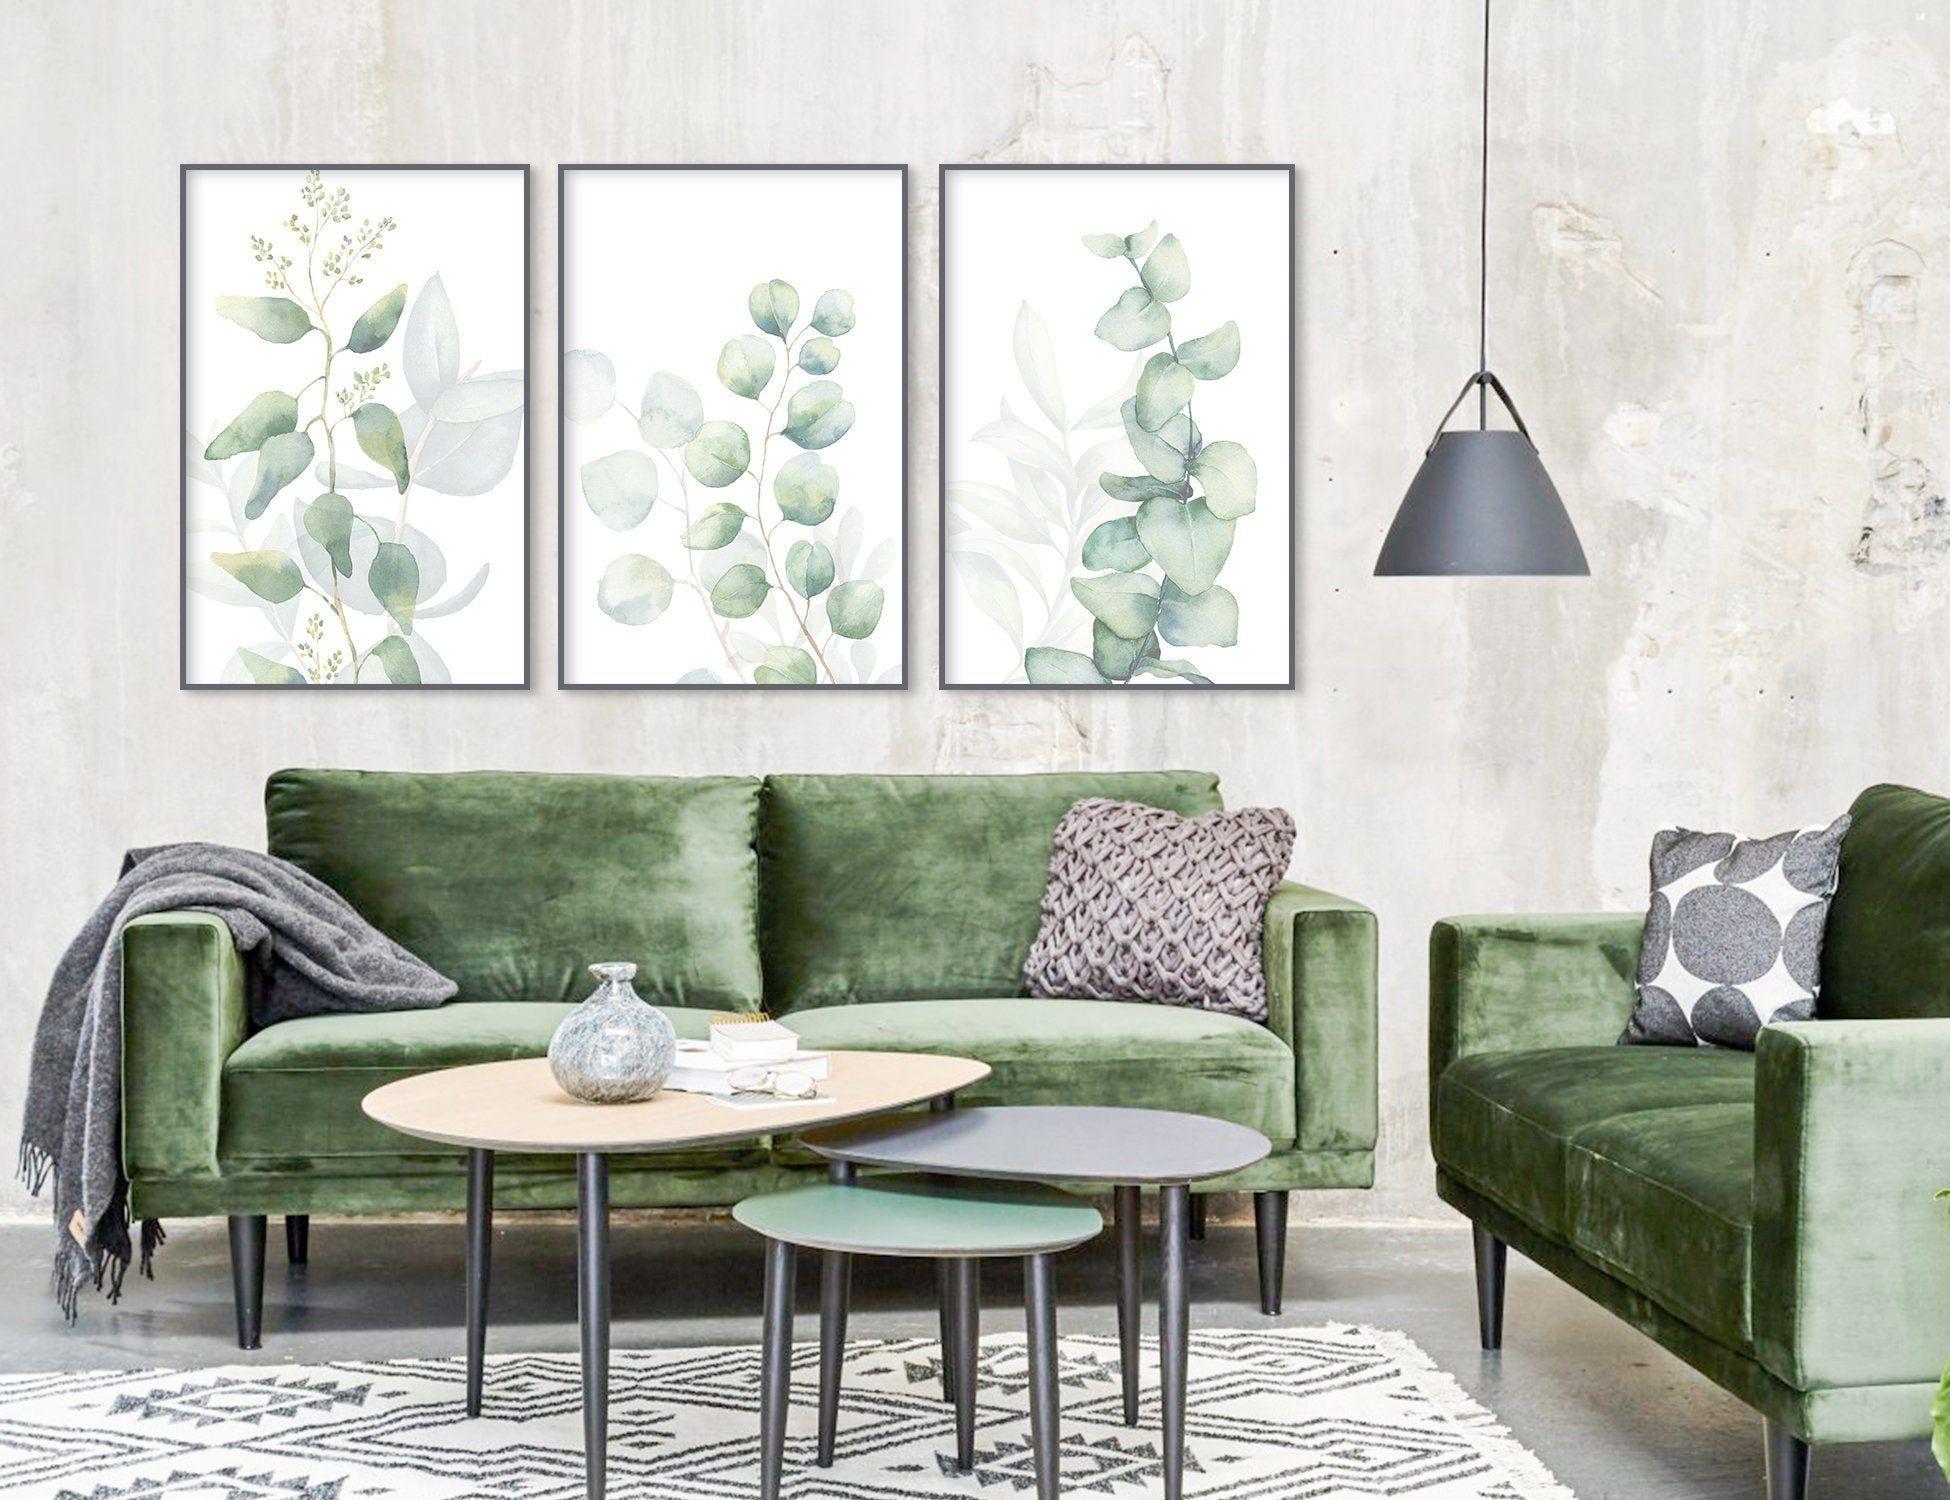 Eucalyptus watercolor wall art prints large green